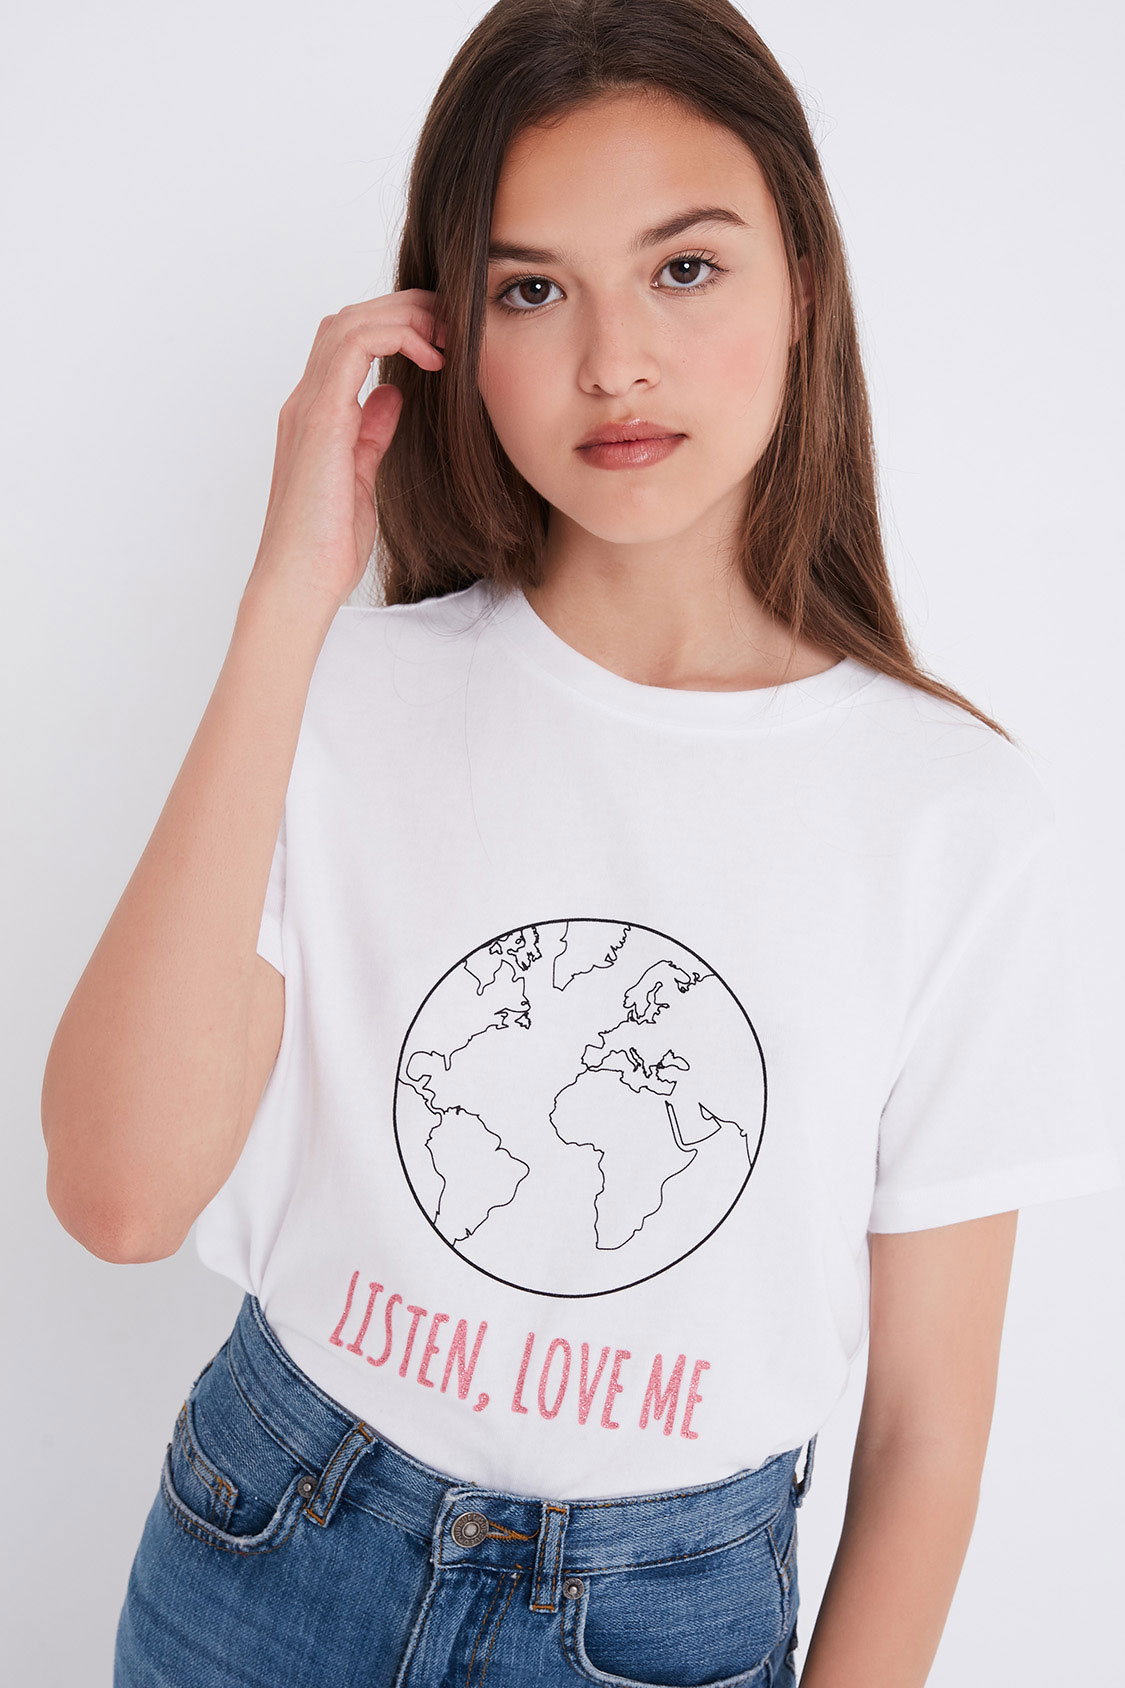 Listen, love me printed t-shirt